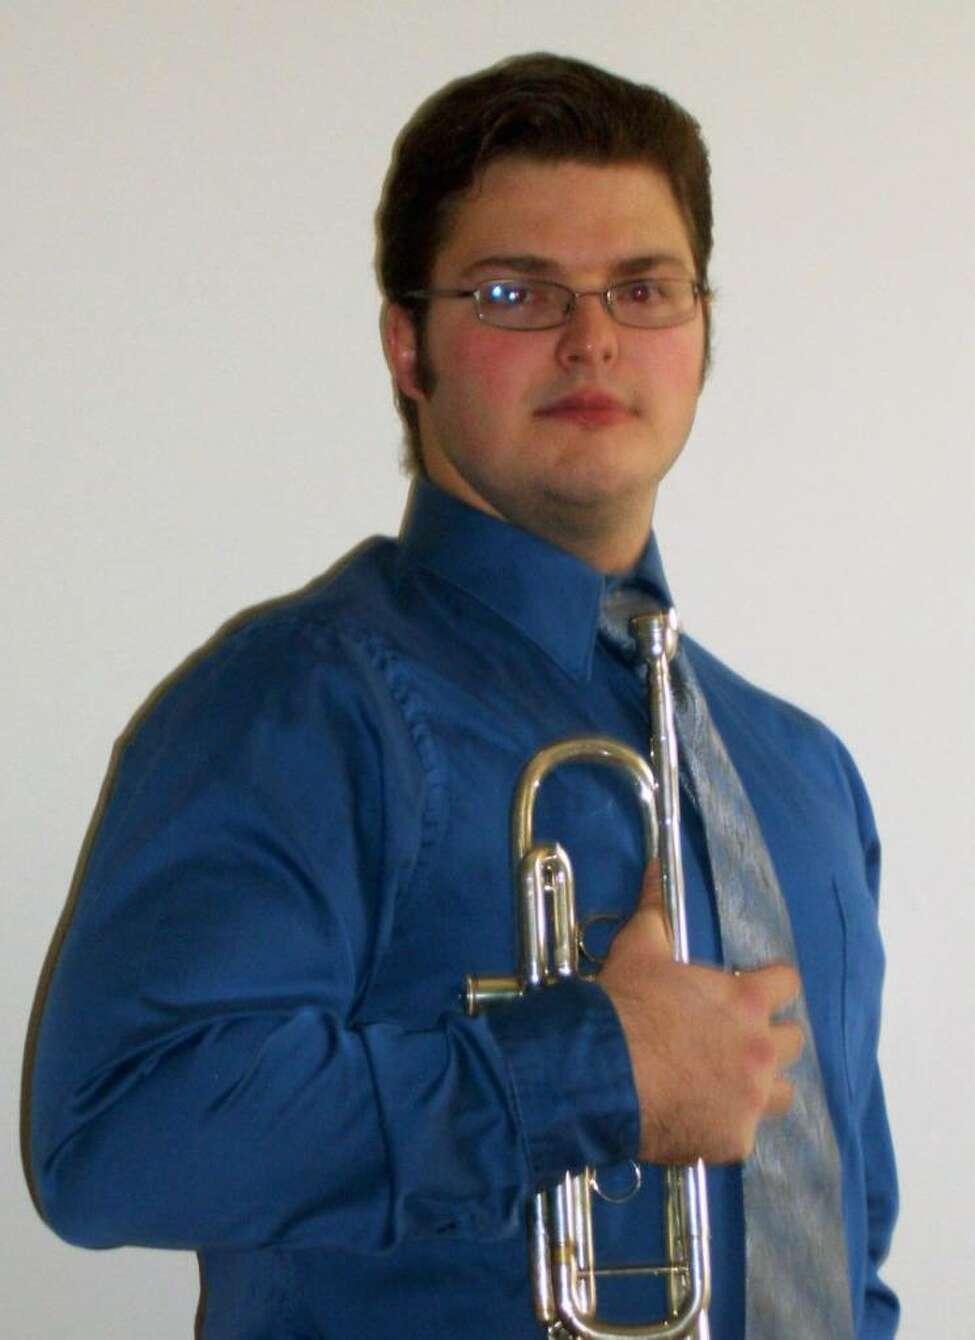 Juilliard student-trumpeter Colin Sieg.